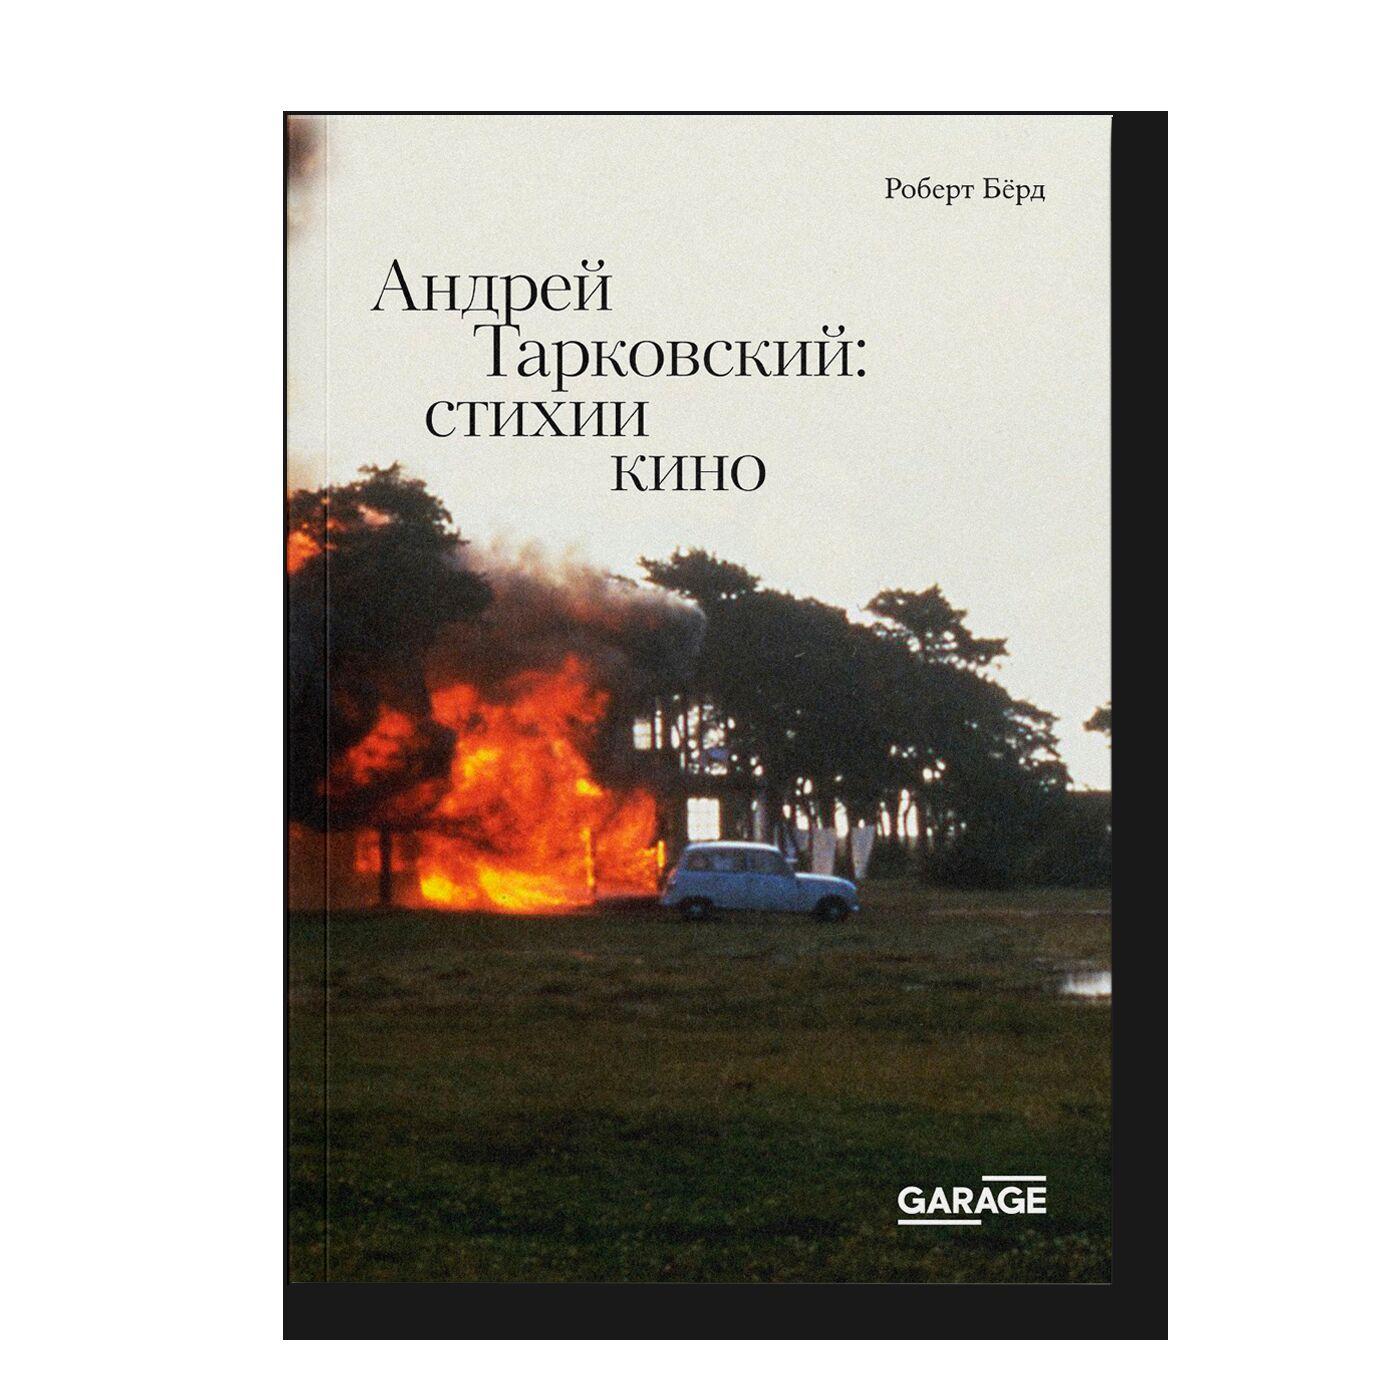 Andrei Tarkovsky: Elements of Cinema